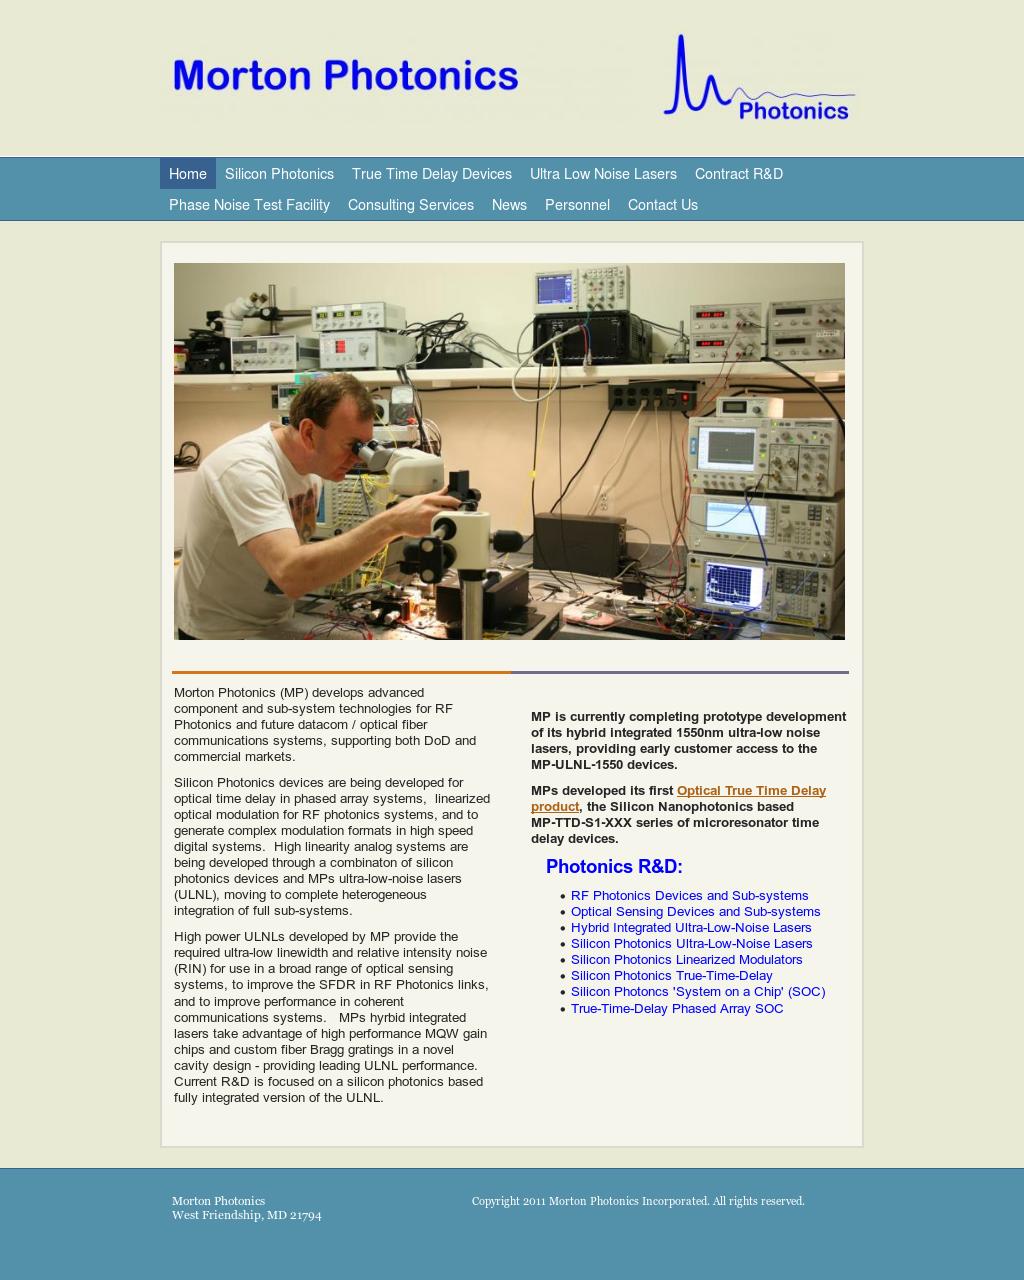 Morton Photonics Competitors, Revenue and Employees - Owler